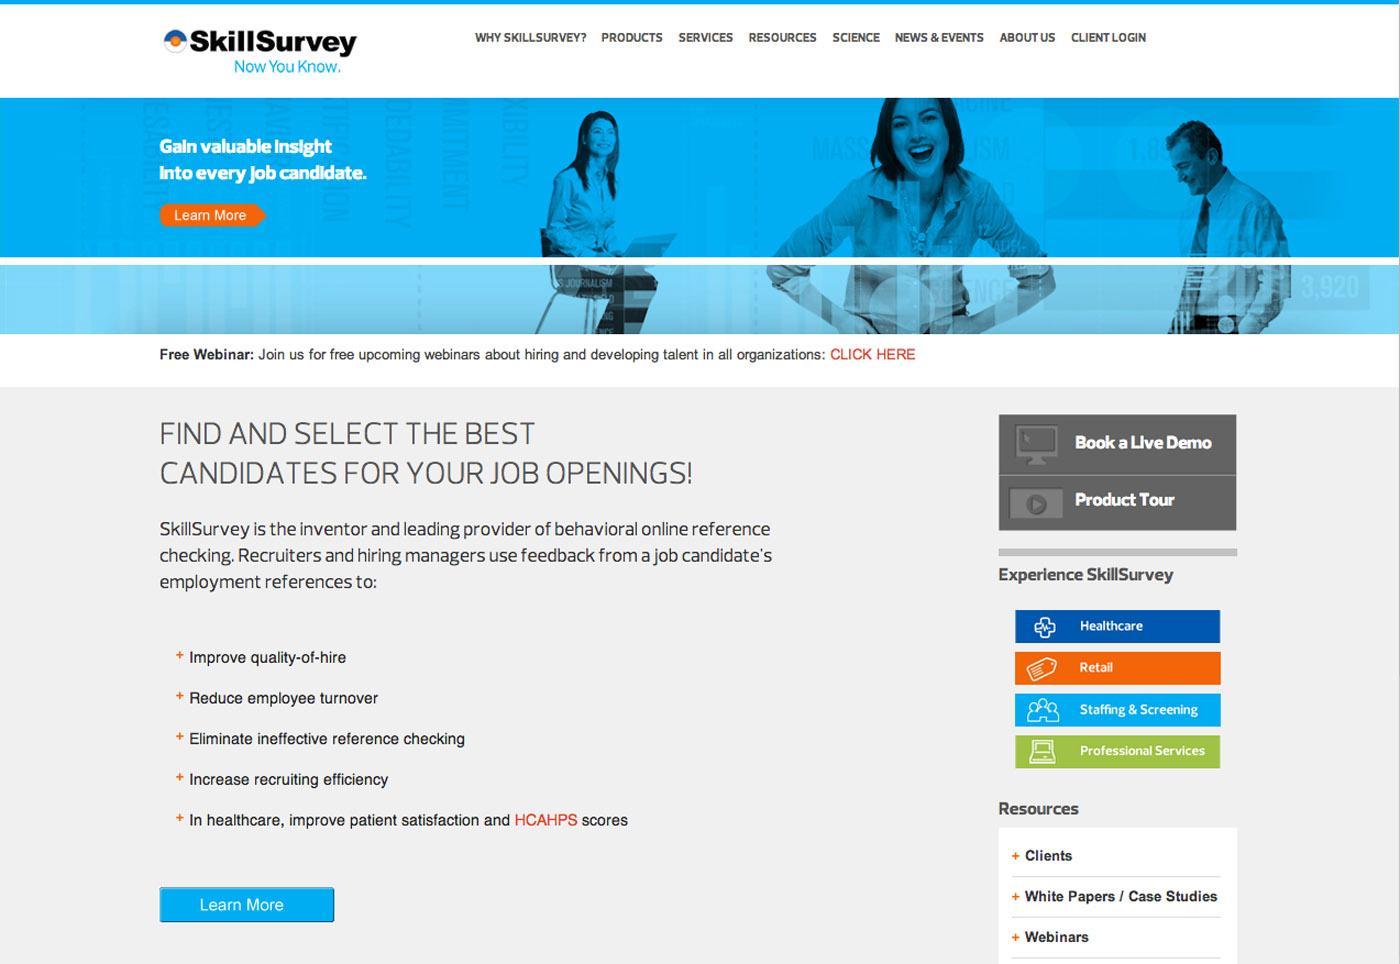 skill survey home page.jpg